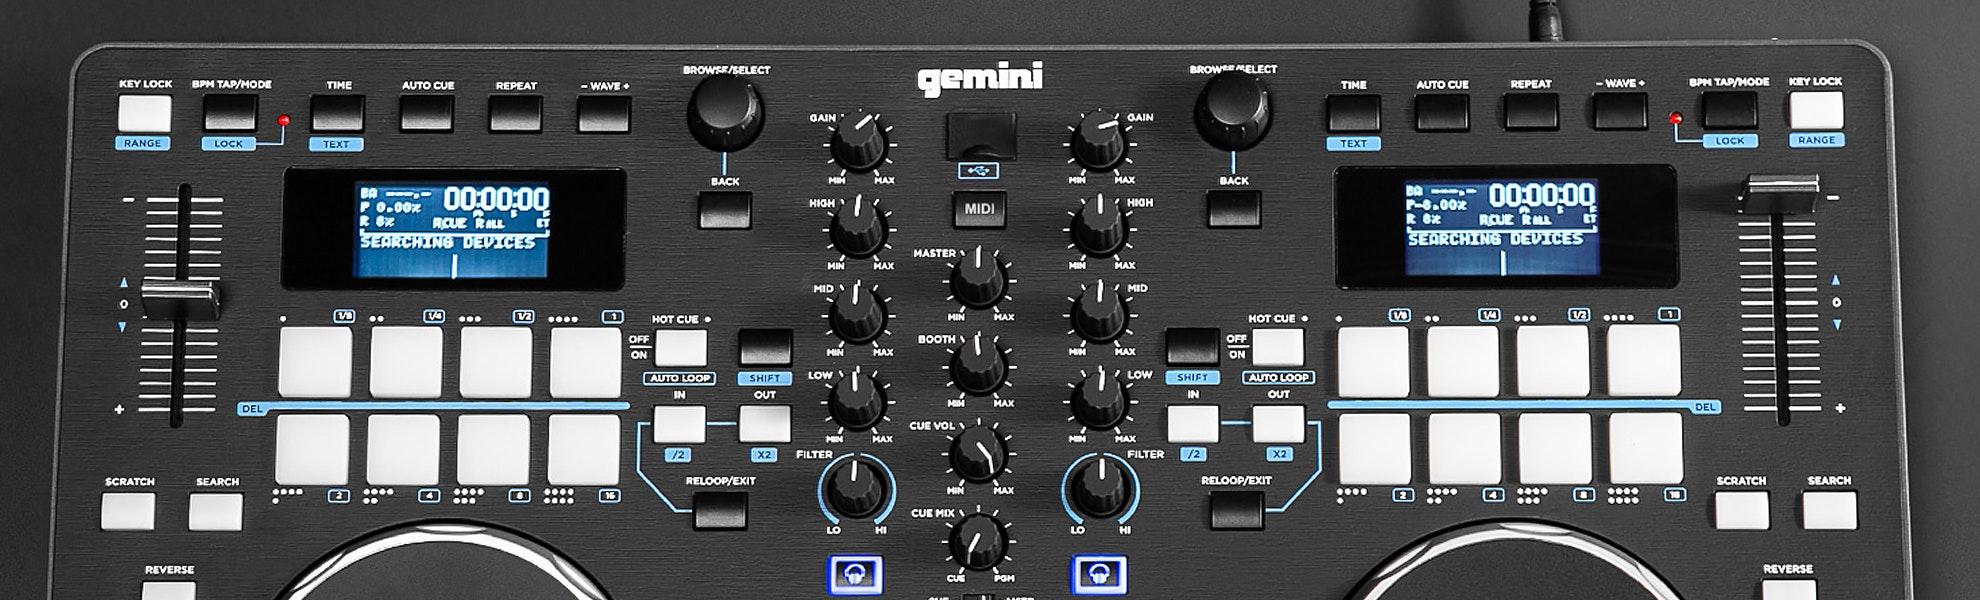 Gemini GMX Media Controller